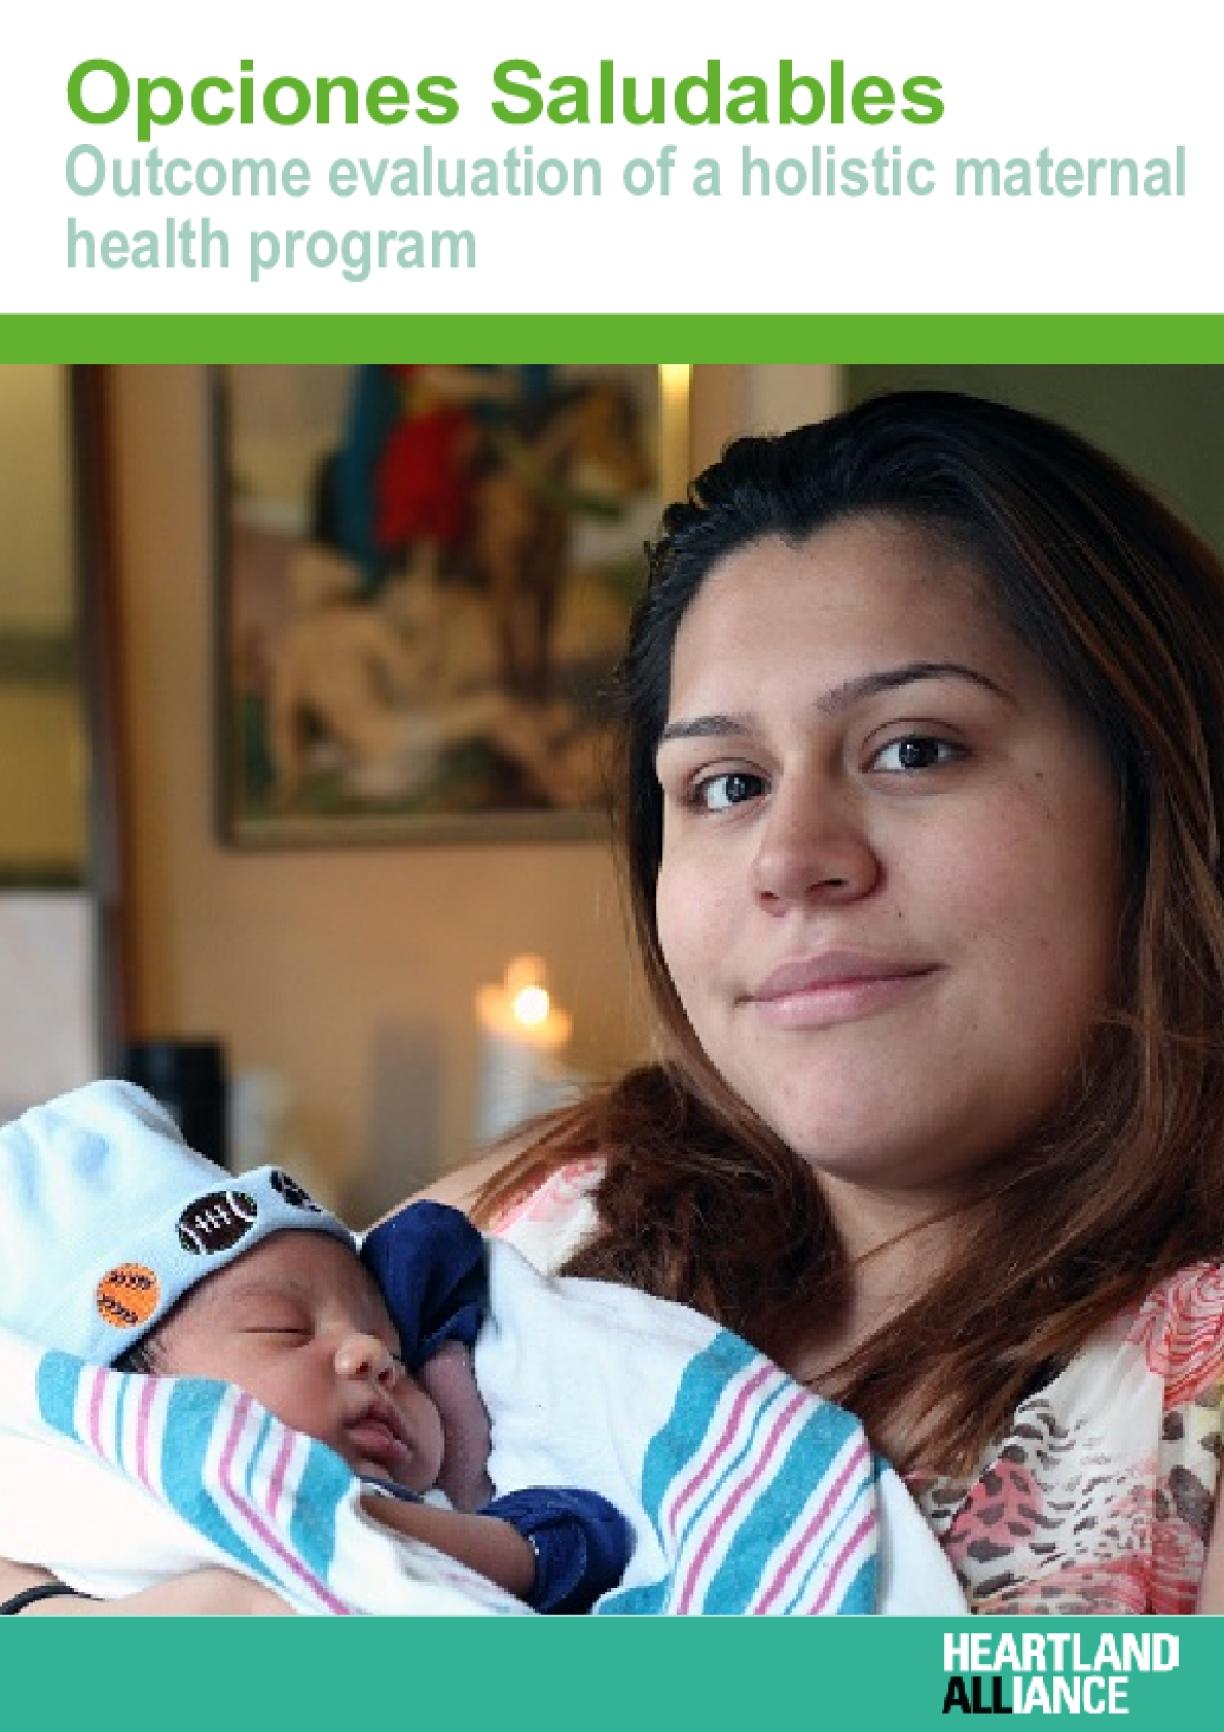 Opciones Saludables: Outcome Evaluation of a Holistic Maternal Health Program